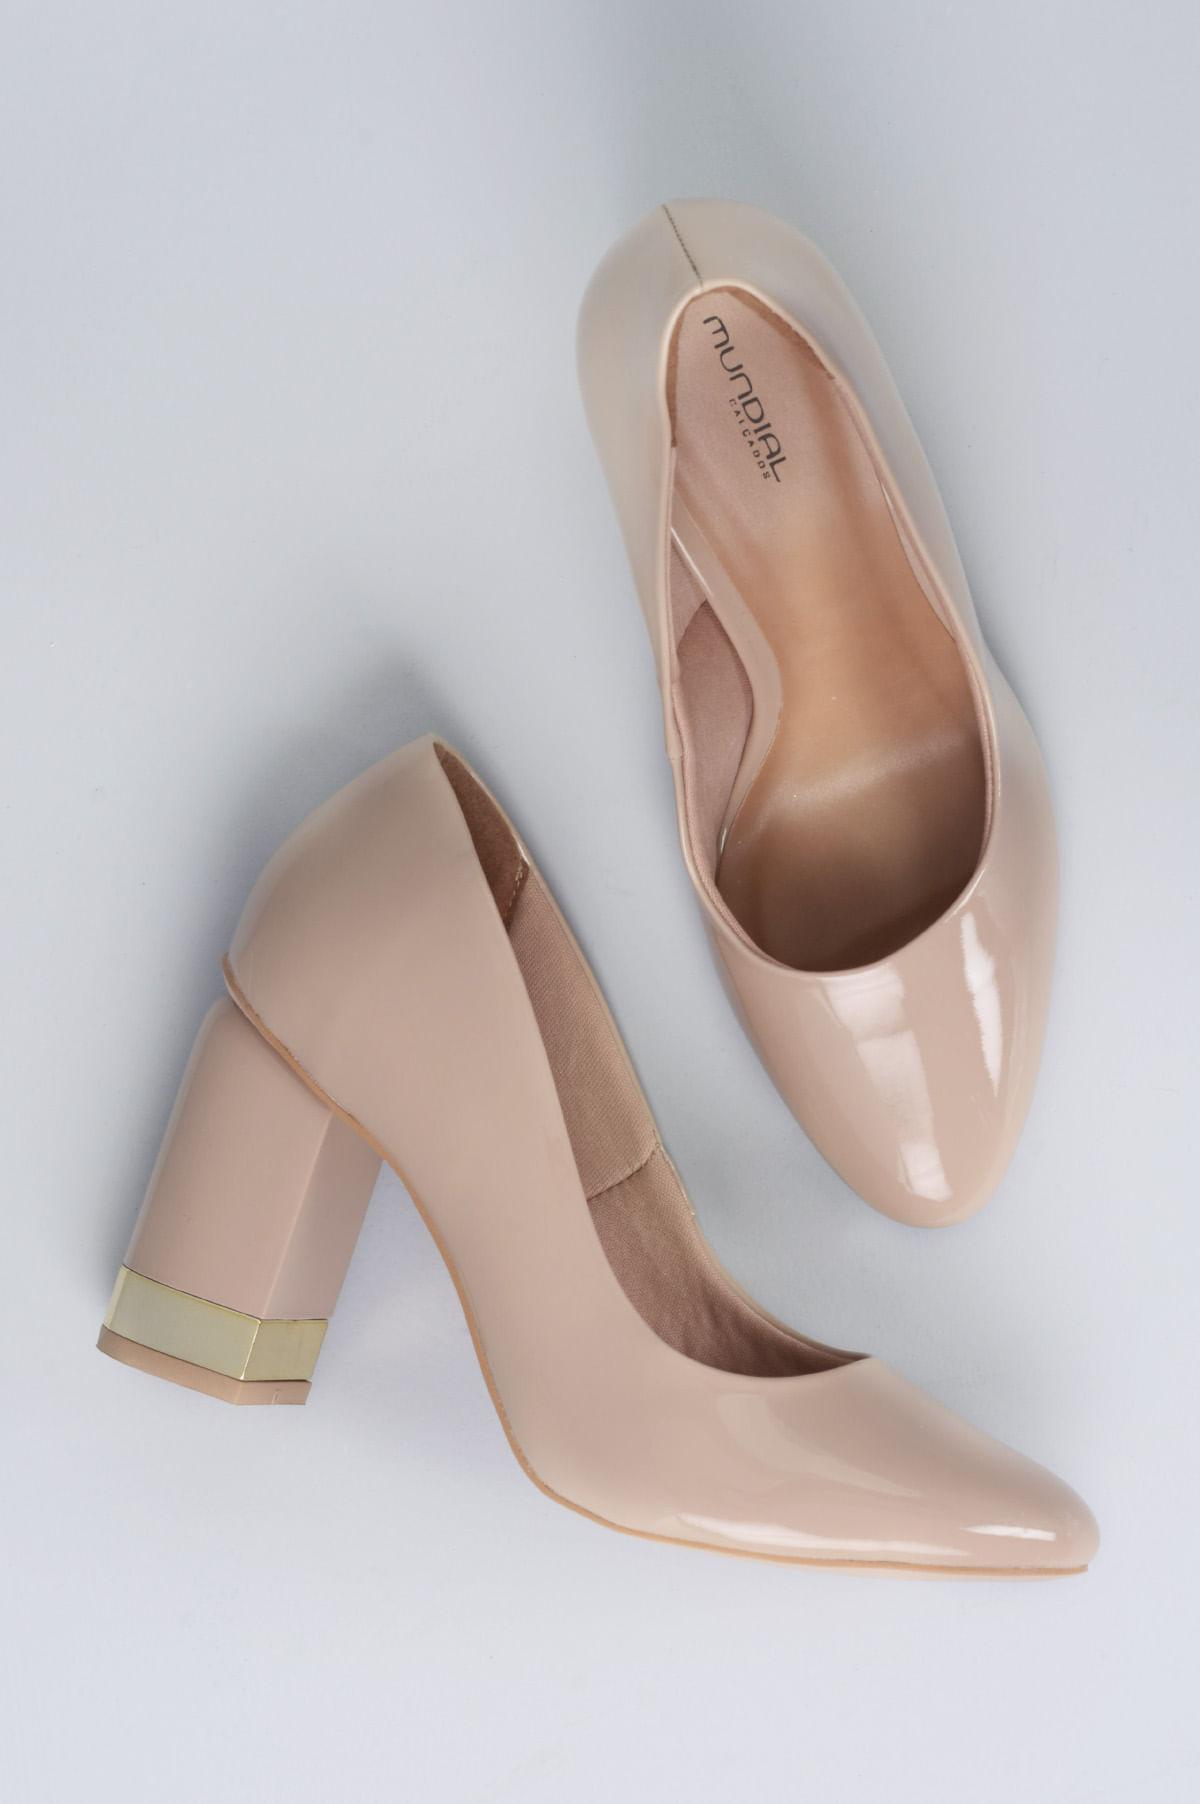 7c46116f20 Sapato Feminino Salto Alto Sable Mundial VERNIZ - BEGE - Mundial ...